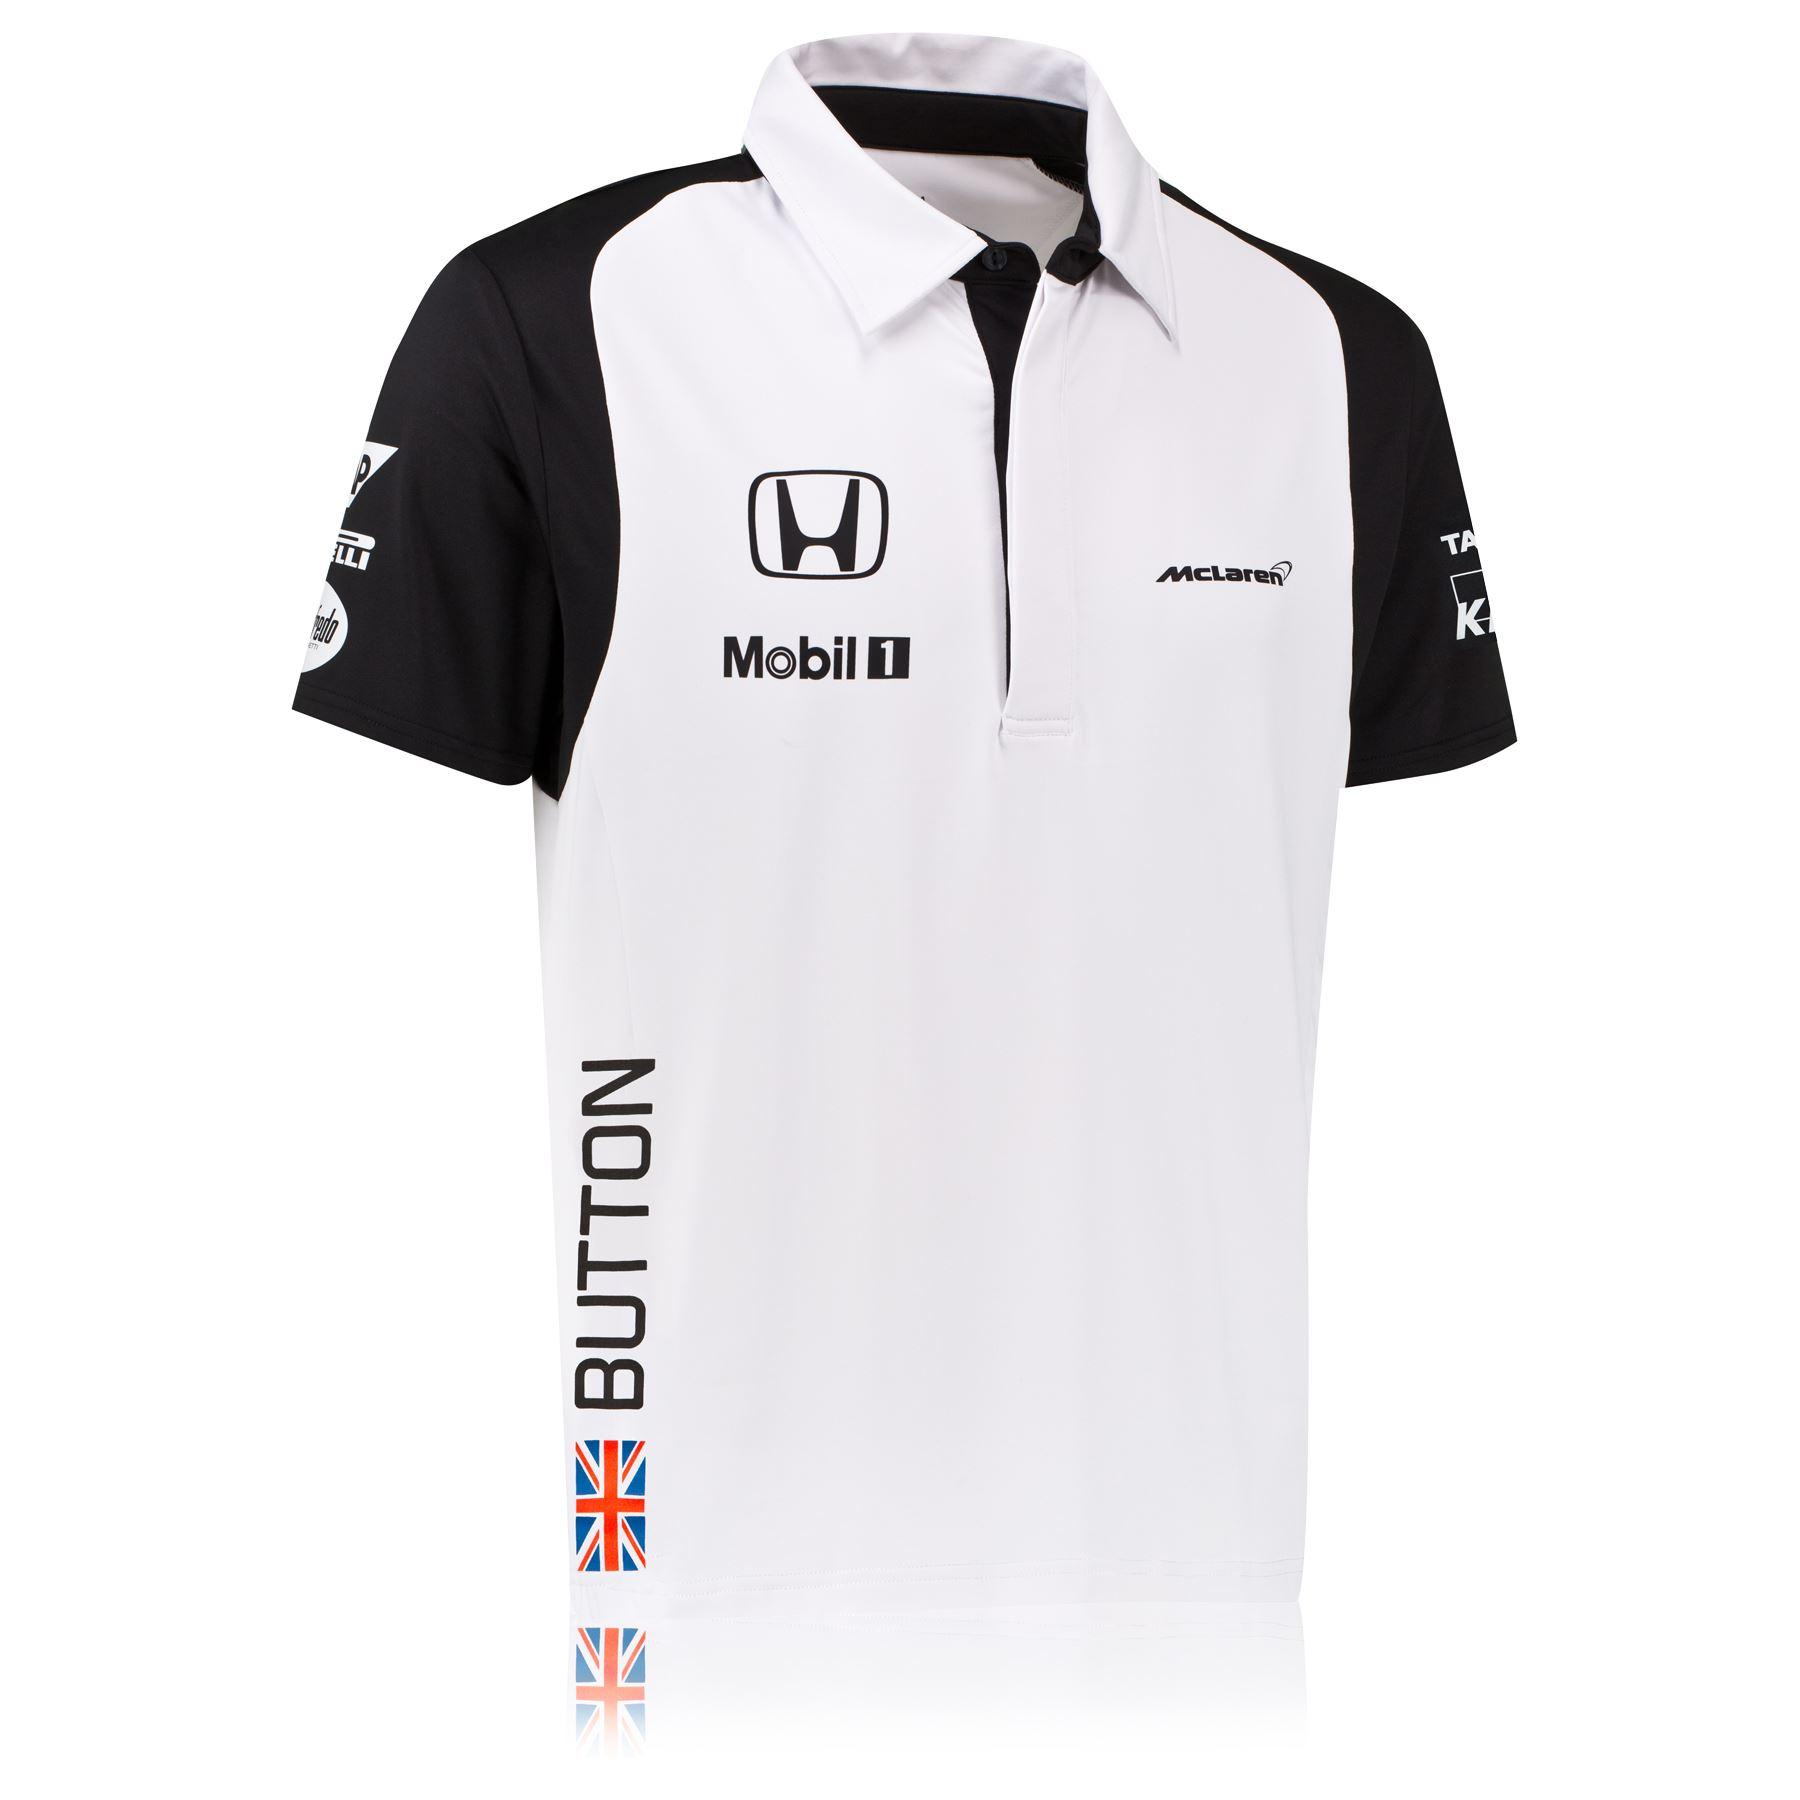 Mclaren Honda Jenson Button Team Short Sleeve Polo Shirt